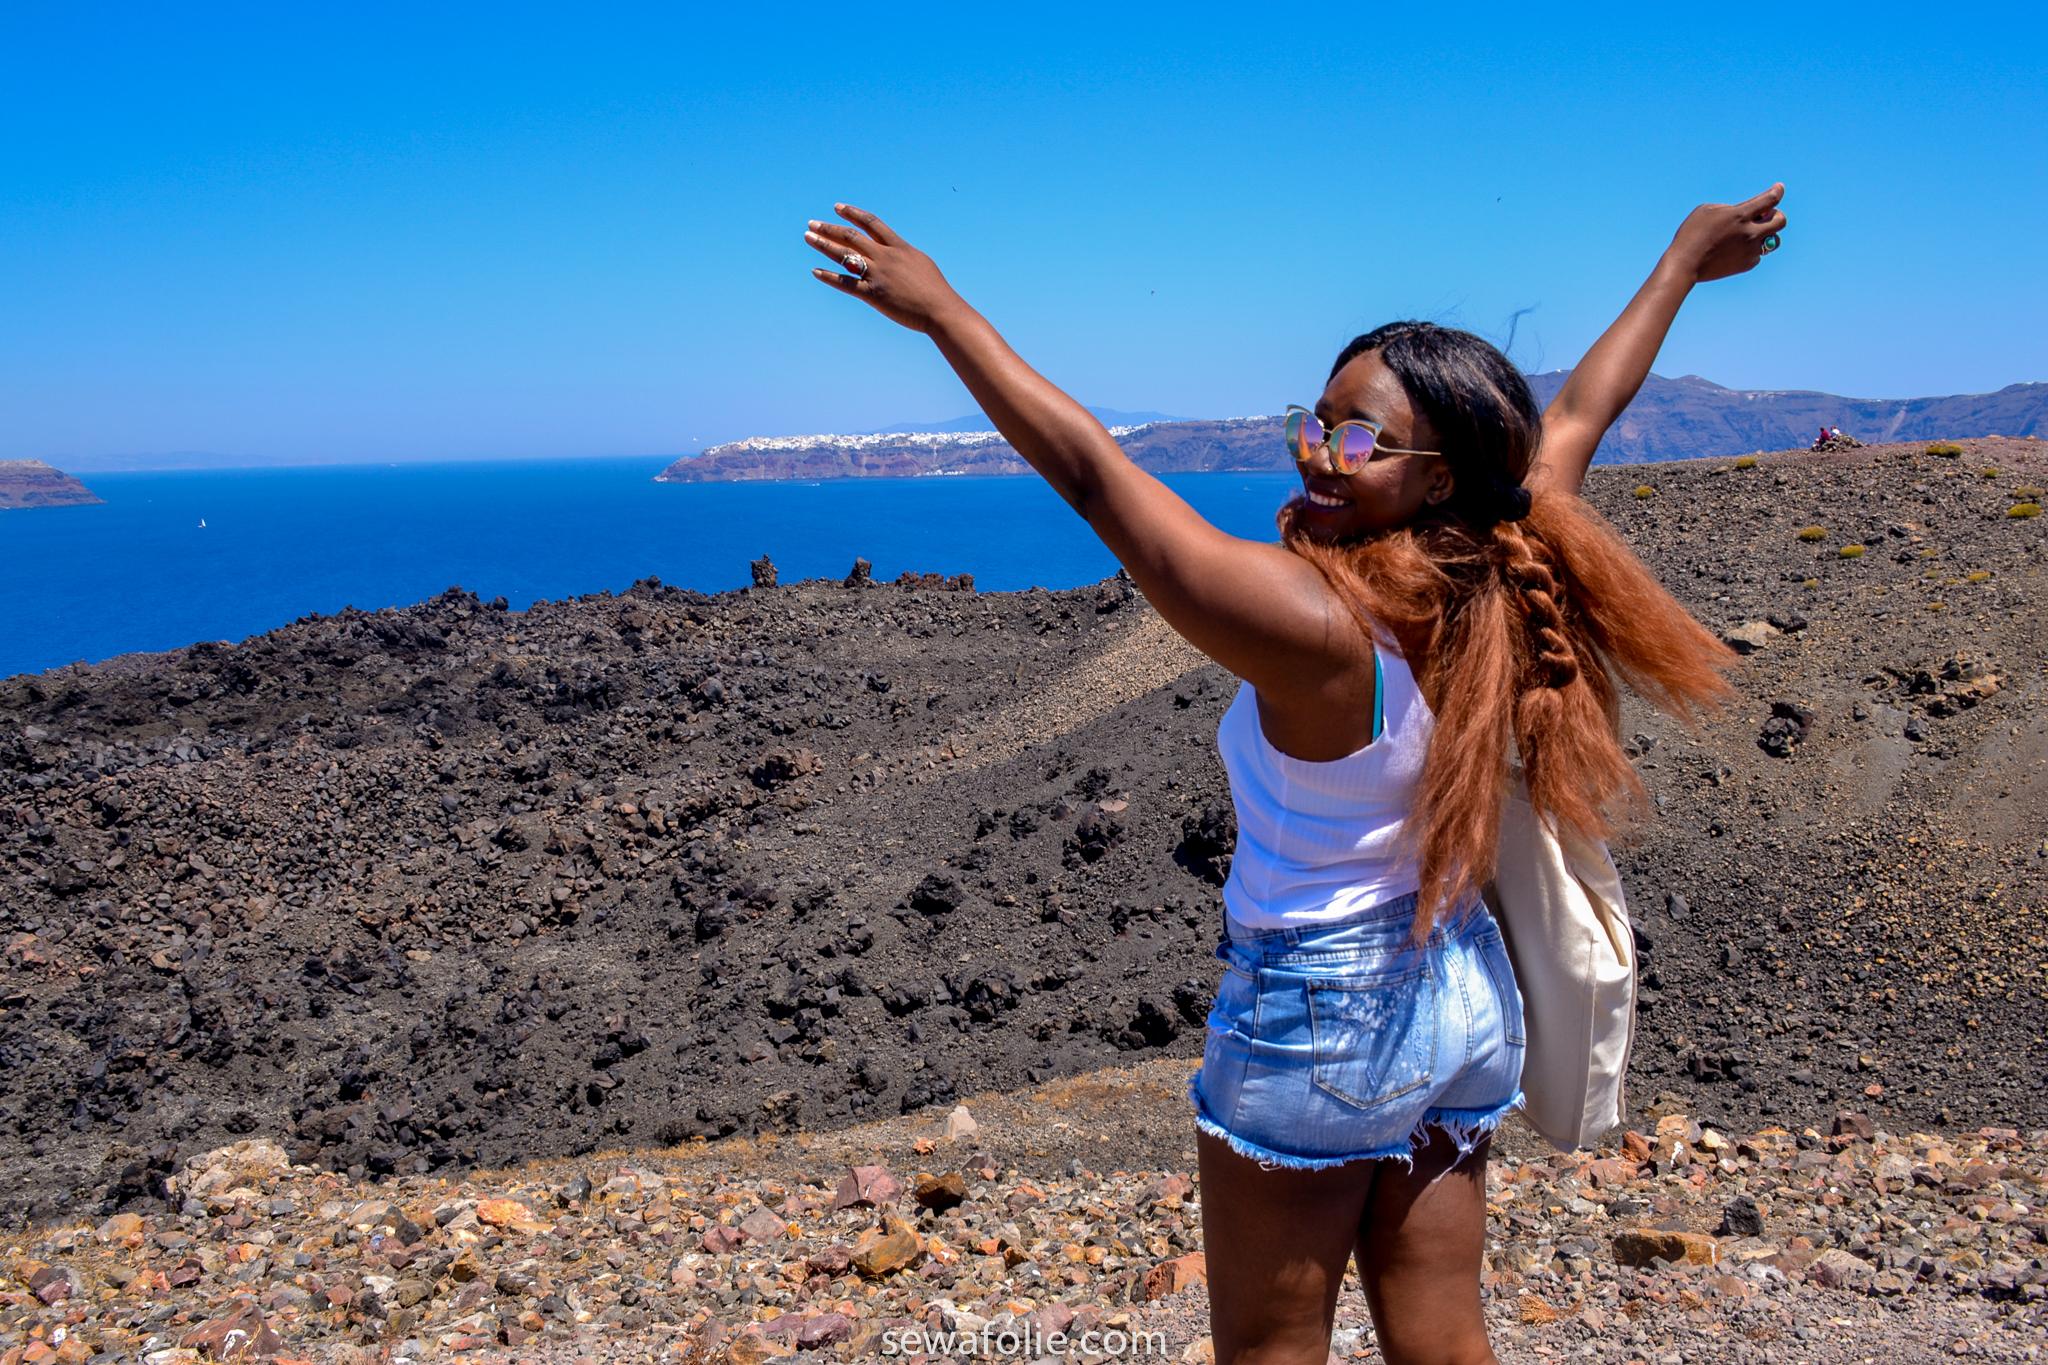 santorini Cyclades island